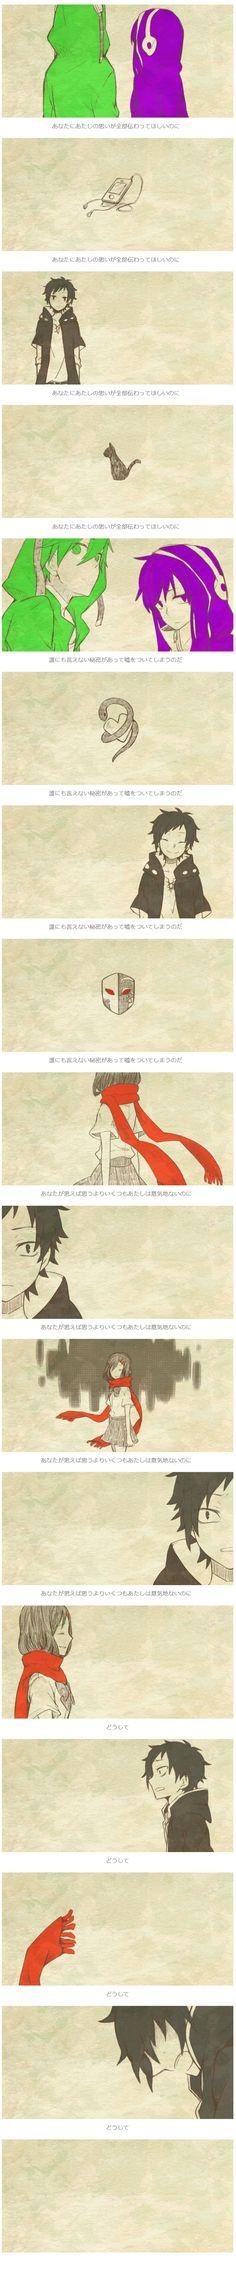 Kido l Seto l Kano l Ayano Kagerou Project, Manga Covers, Manga Anime, Dark Anime, Happy Summer, Actors, Light Novel, Anime Ships, Asian Art